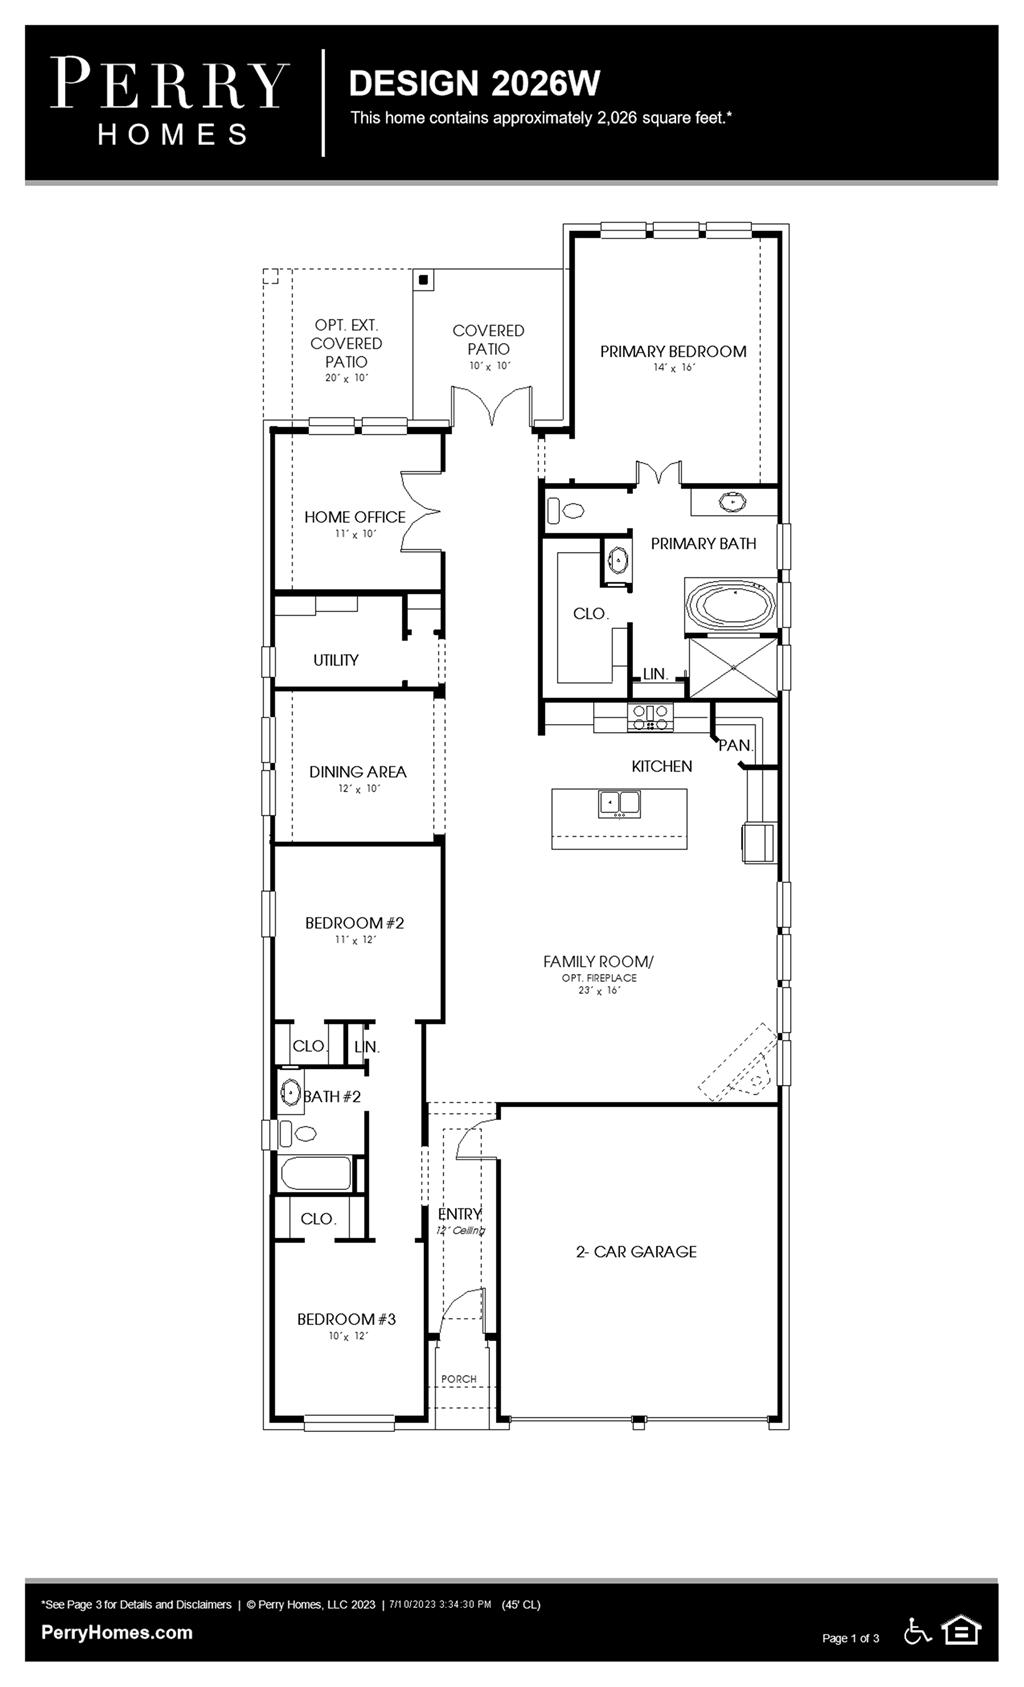 Floor Plan for 2026W